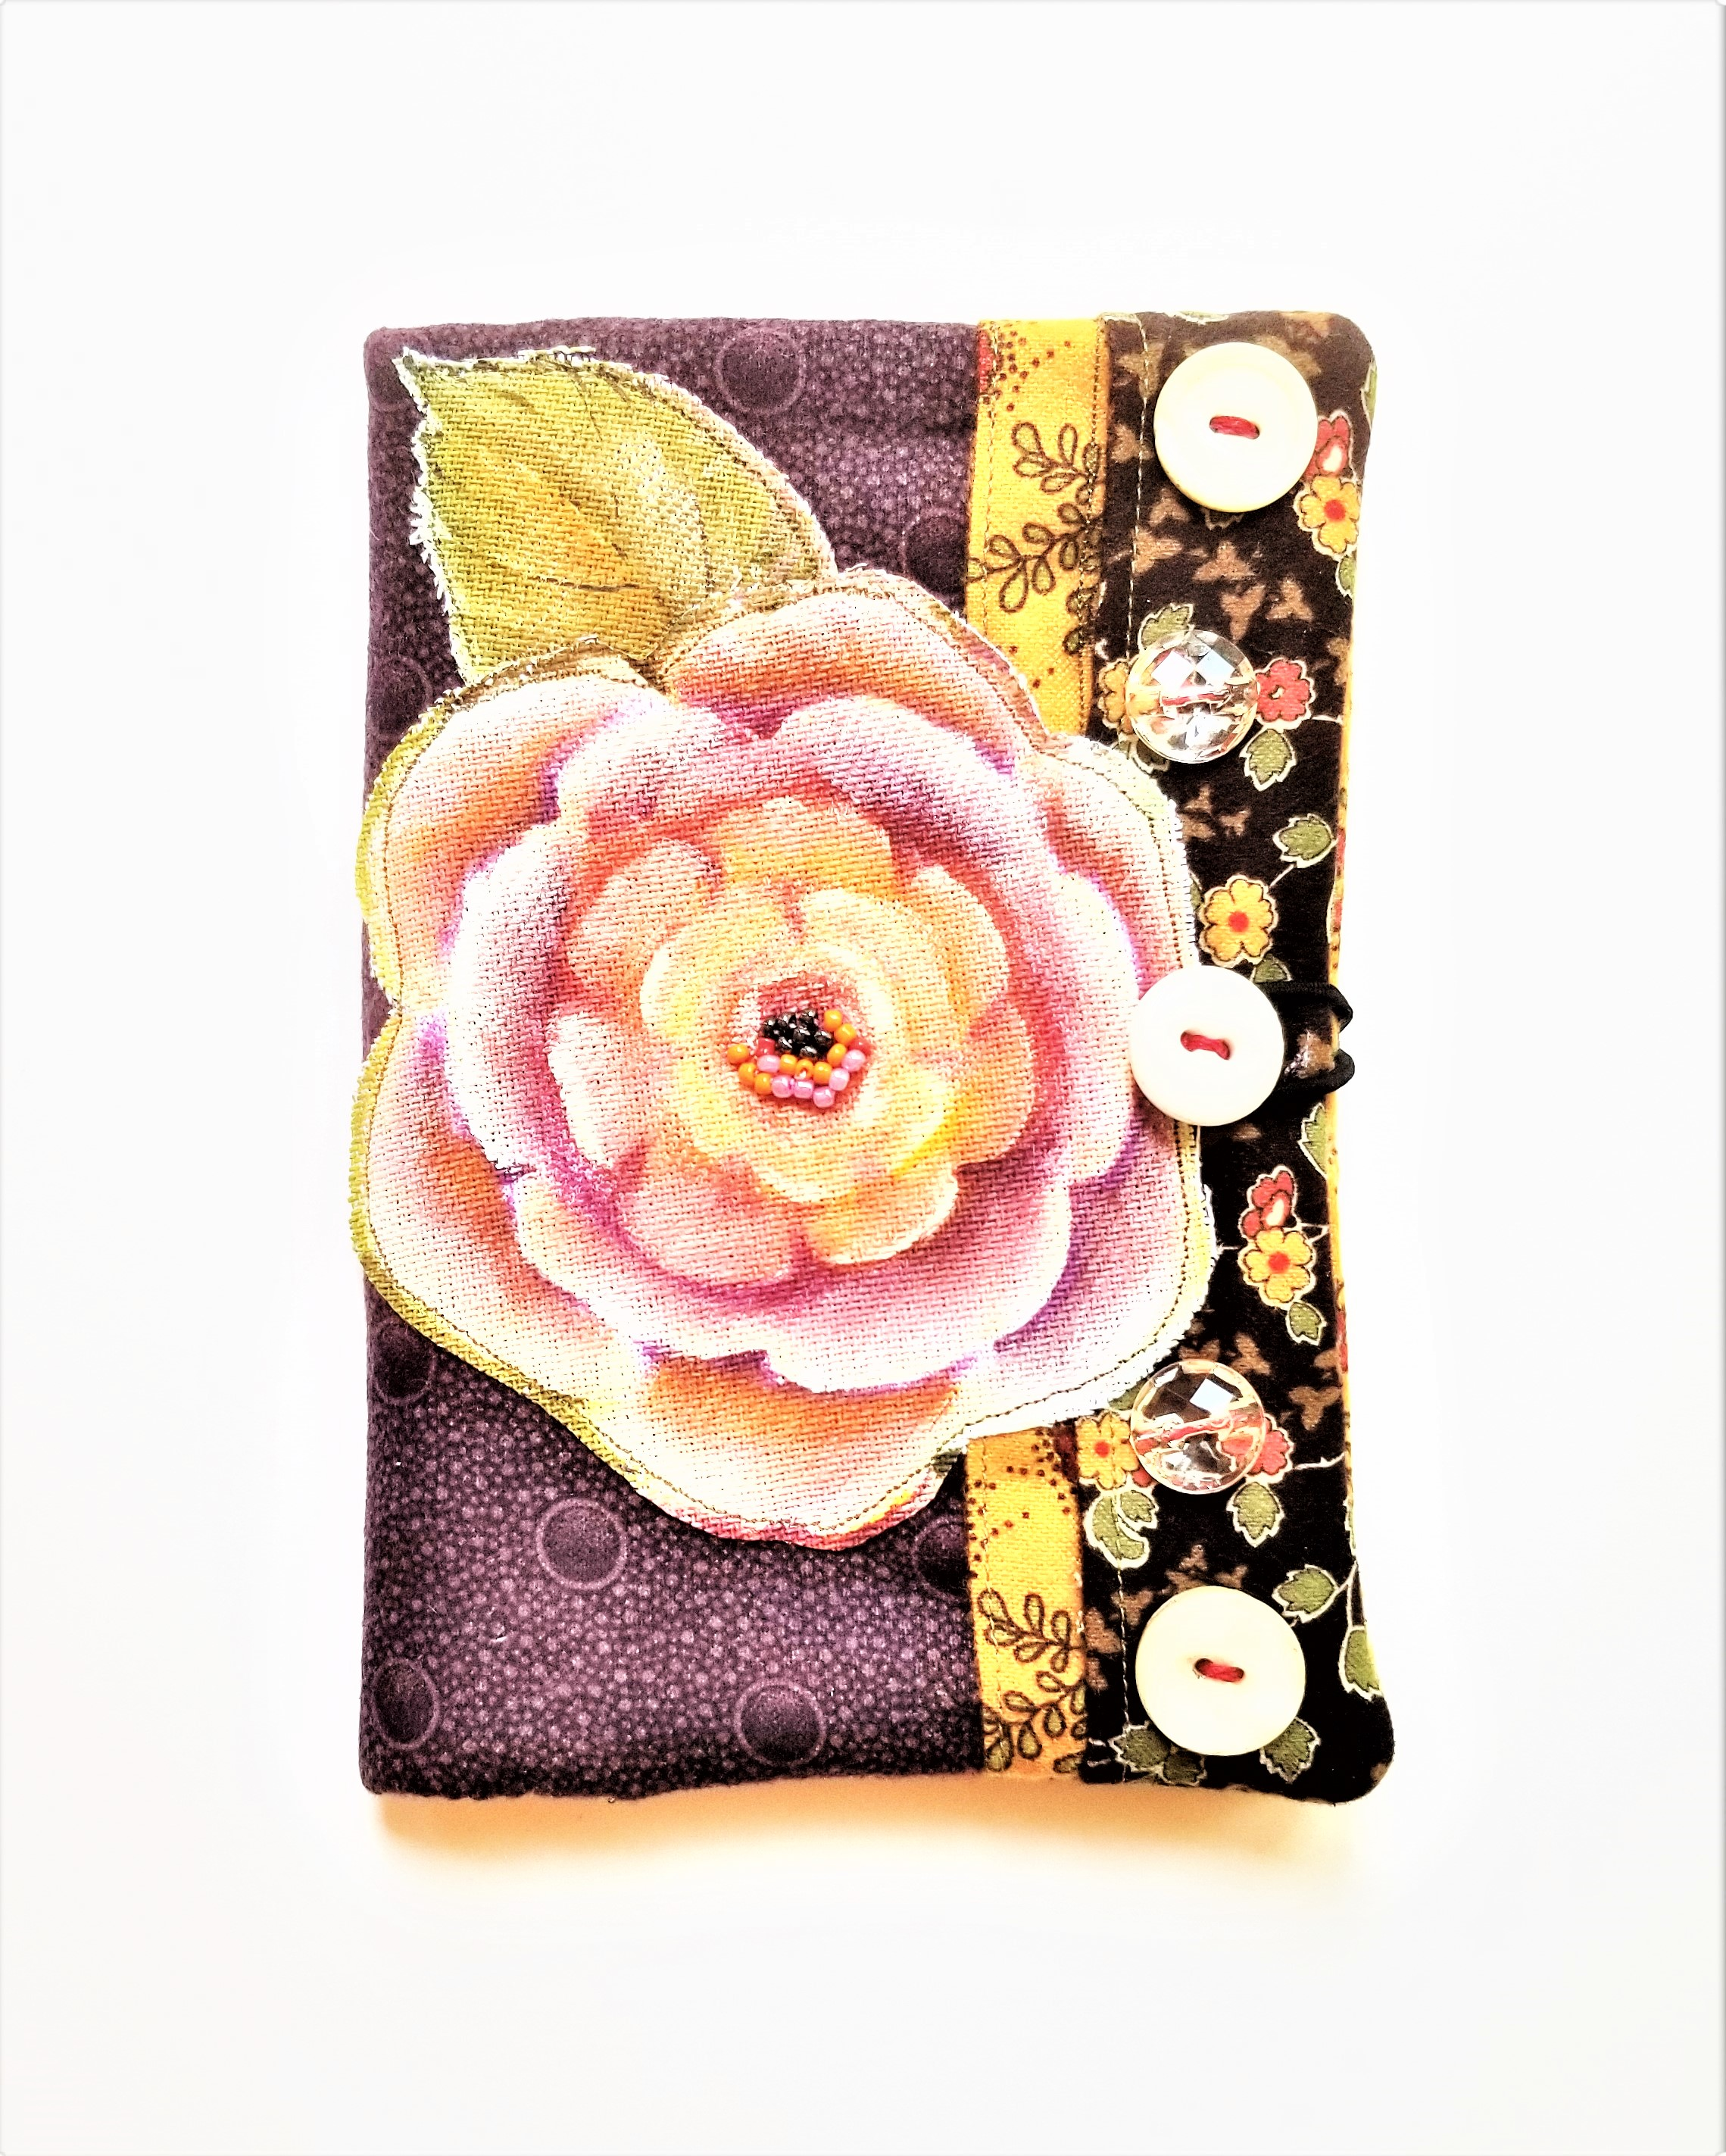 Vintage Floral Passport Wallet by Robin Larido.jpg